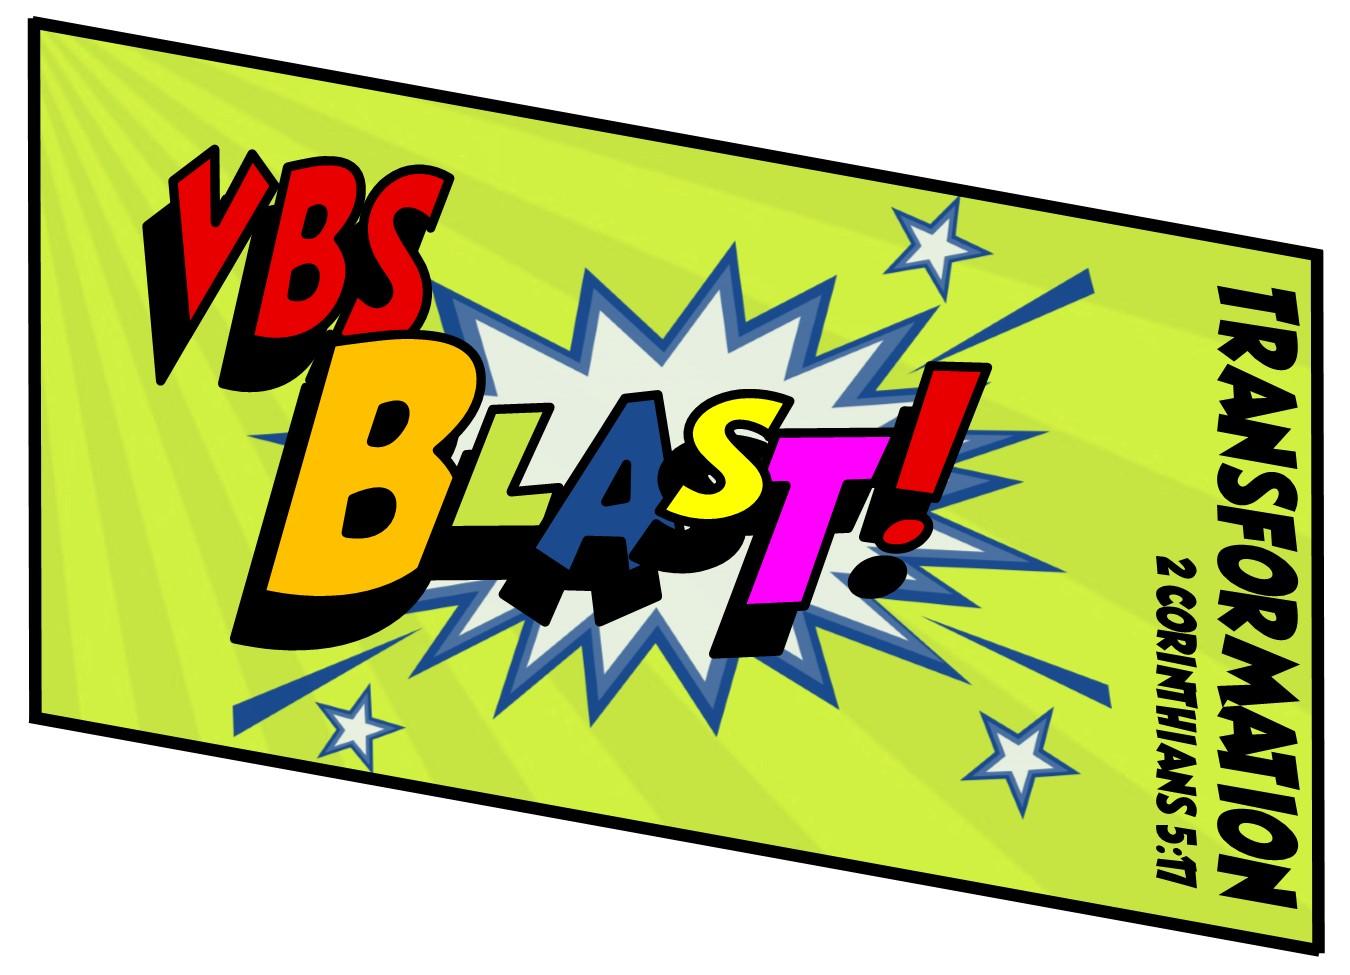 images/VBS_Logo_2020.png